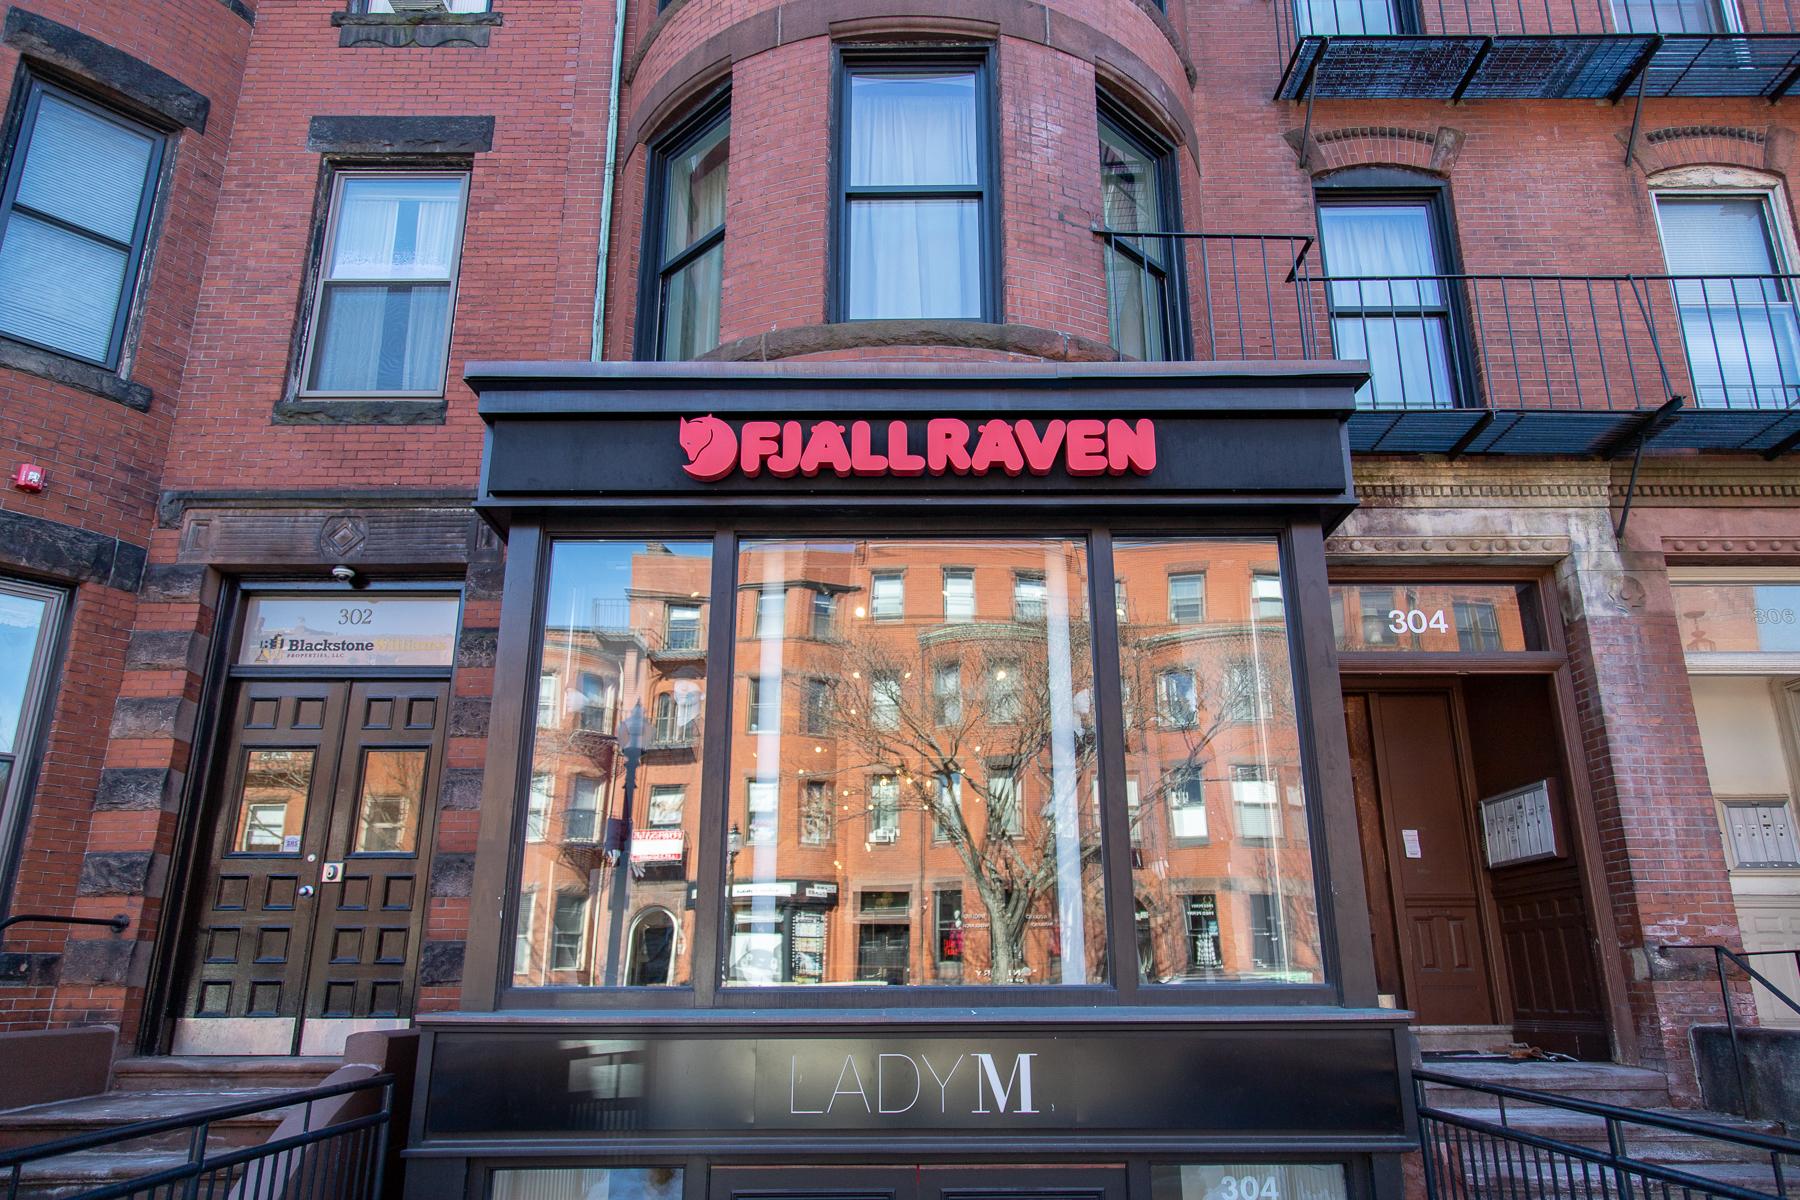 Fjallraven retailer in Boston, Massachusetts